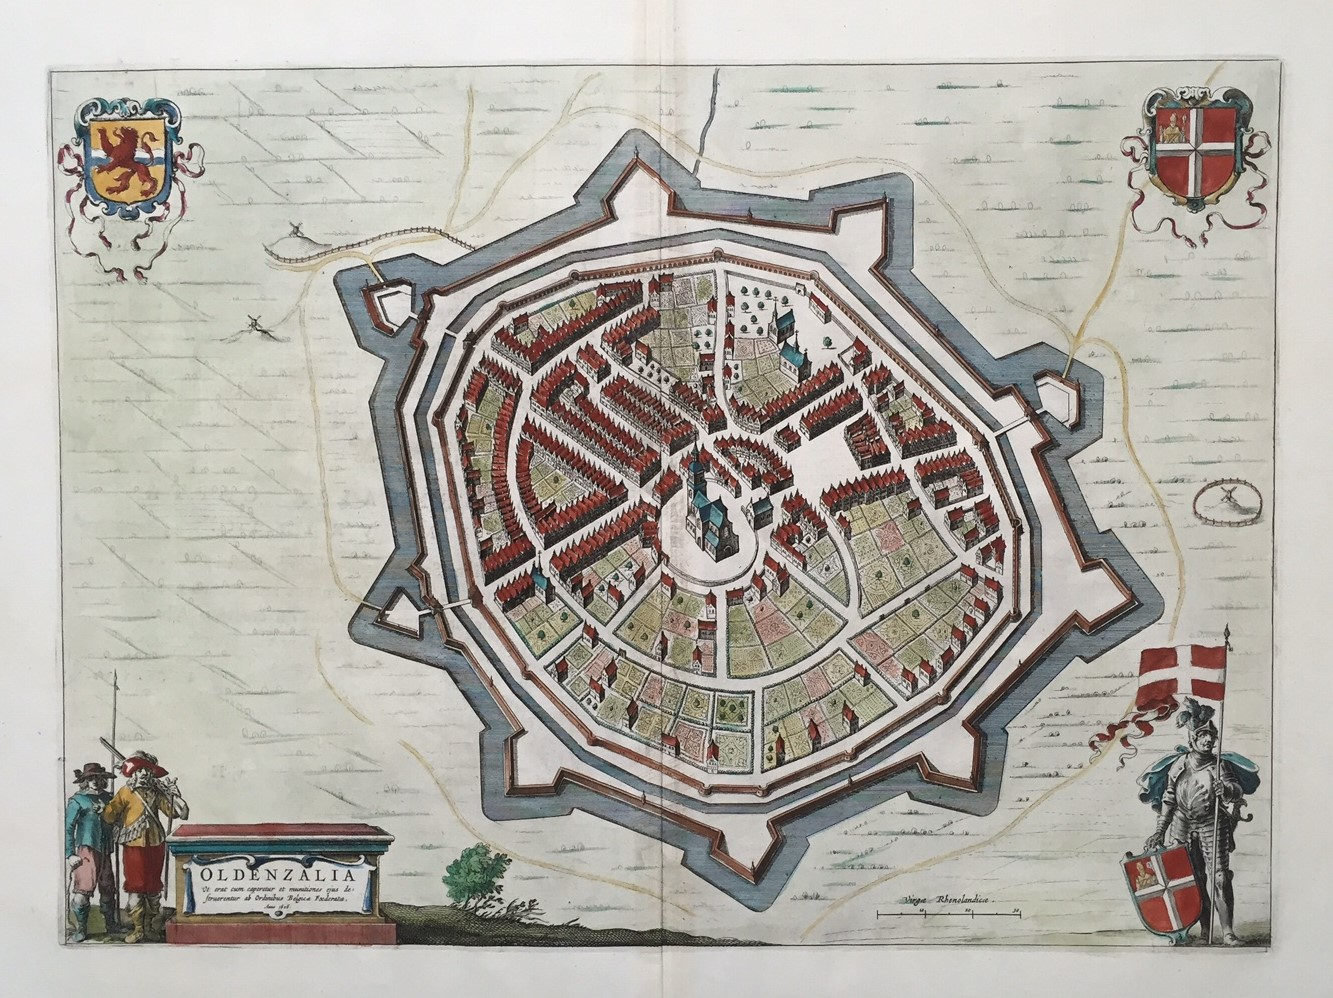 Oldenzaal blaeu 1649 mappamaps - Oldenzaal mobel ...